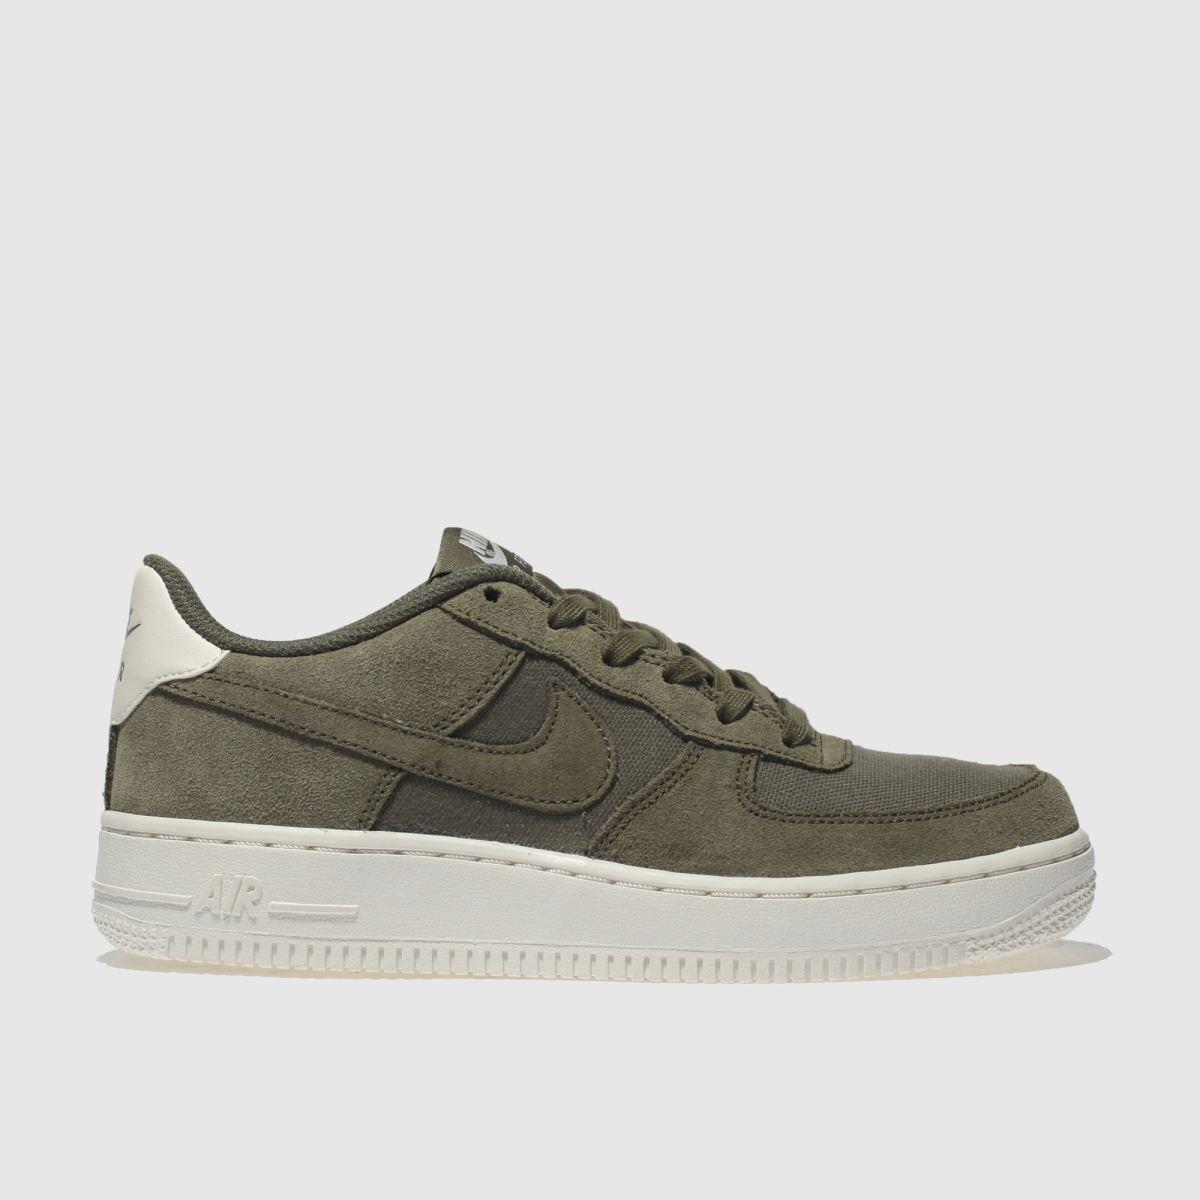 Nike Khaki Air Force 1 Trainers Youth